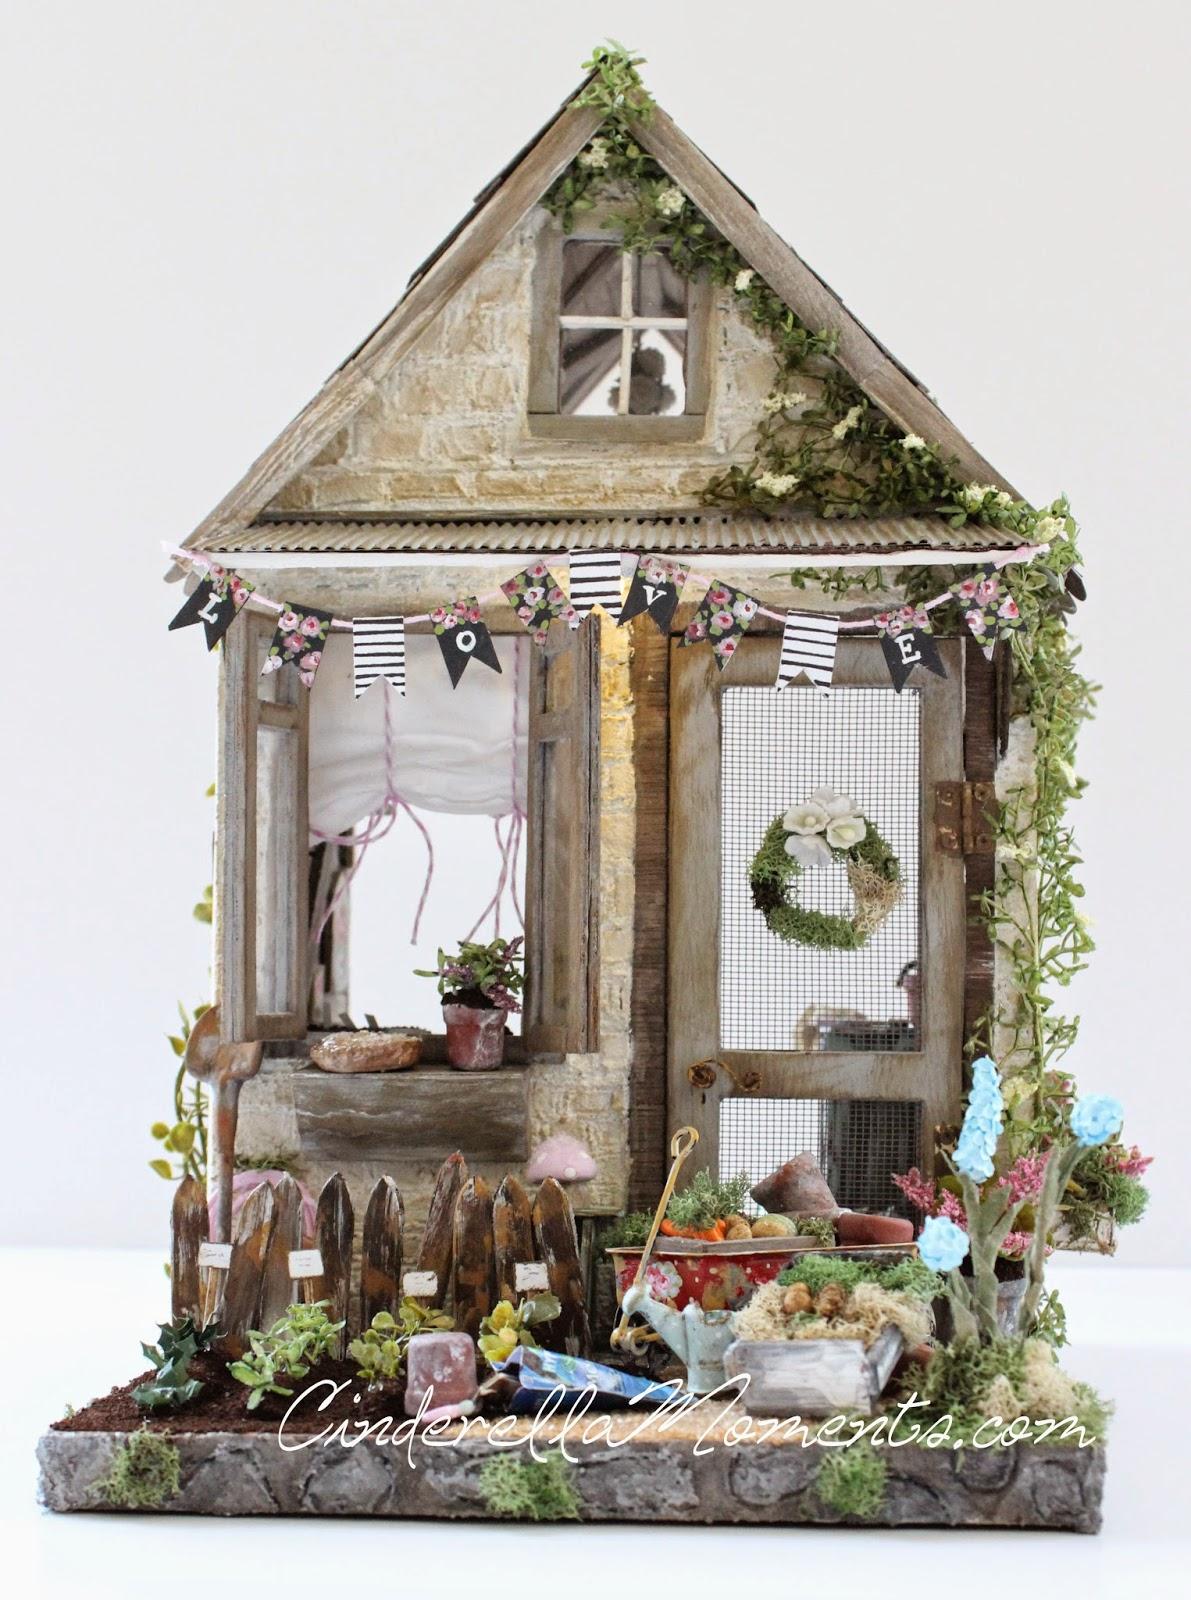 cinderella moments petite maison de jardin custom dollhouse. Black Bedroom Furniture Sets. Home Design Ideas